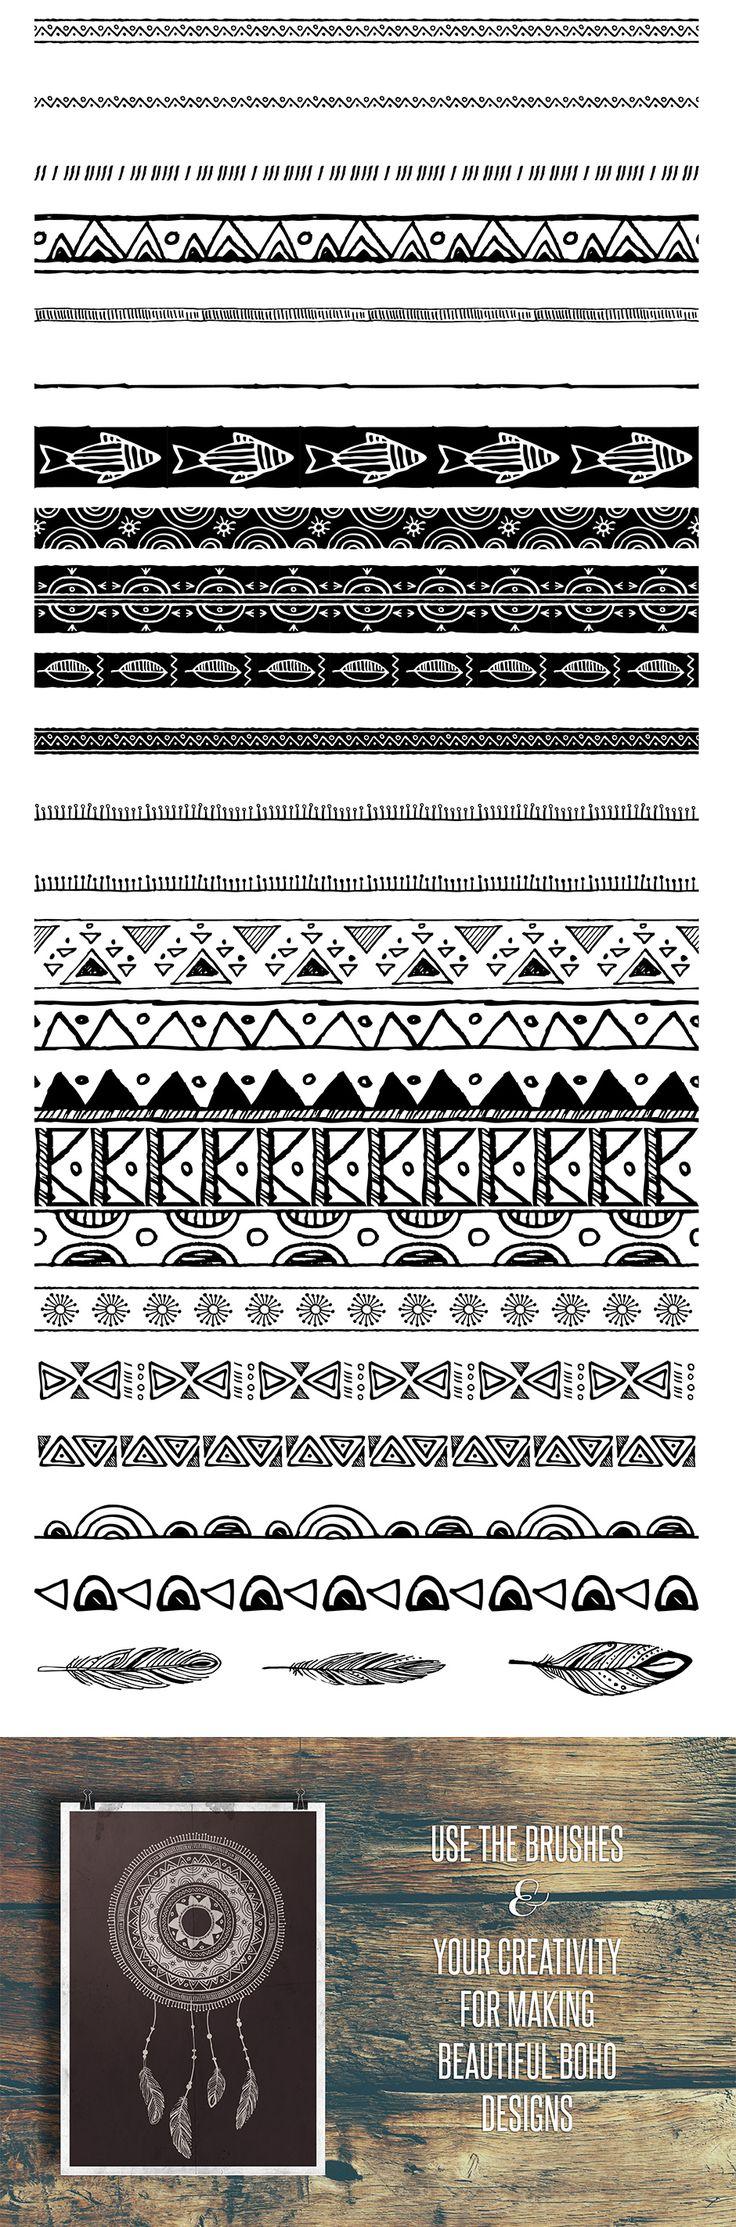 50 Boho Tribal Gypsy Brushes - https://www.designcuts.com/product/50-boho-tribal-gypsy-brushes/